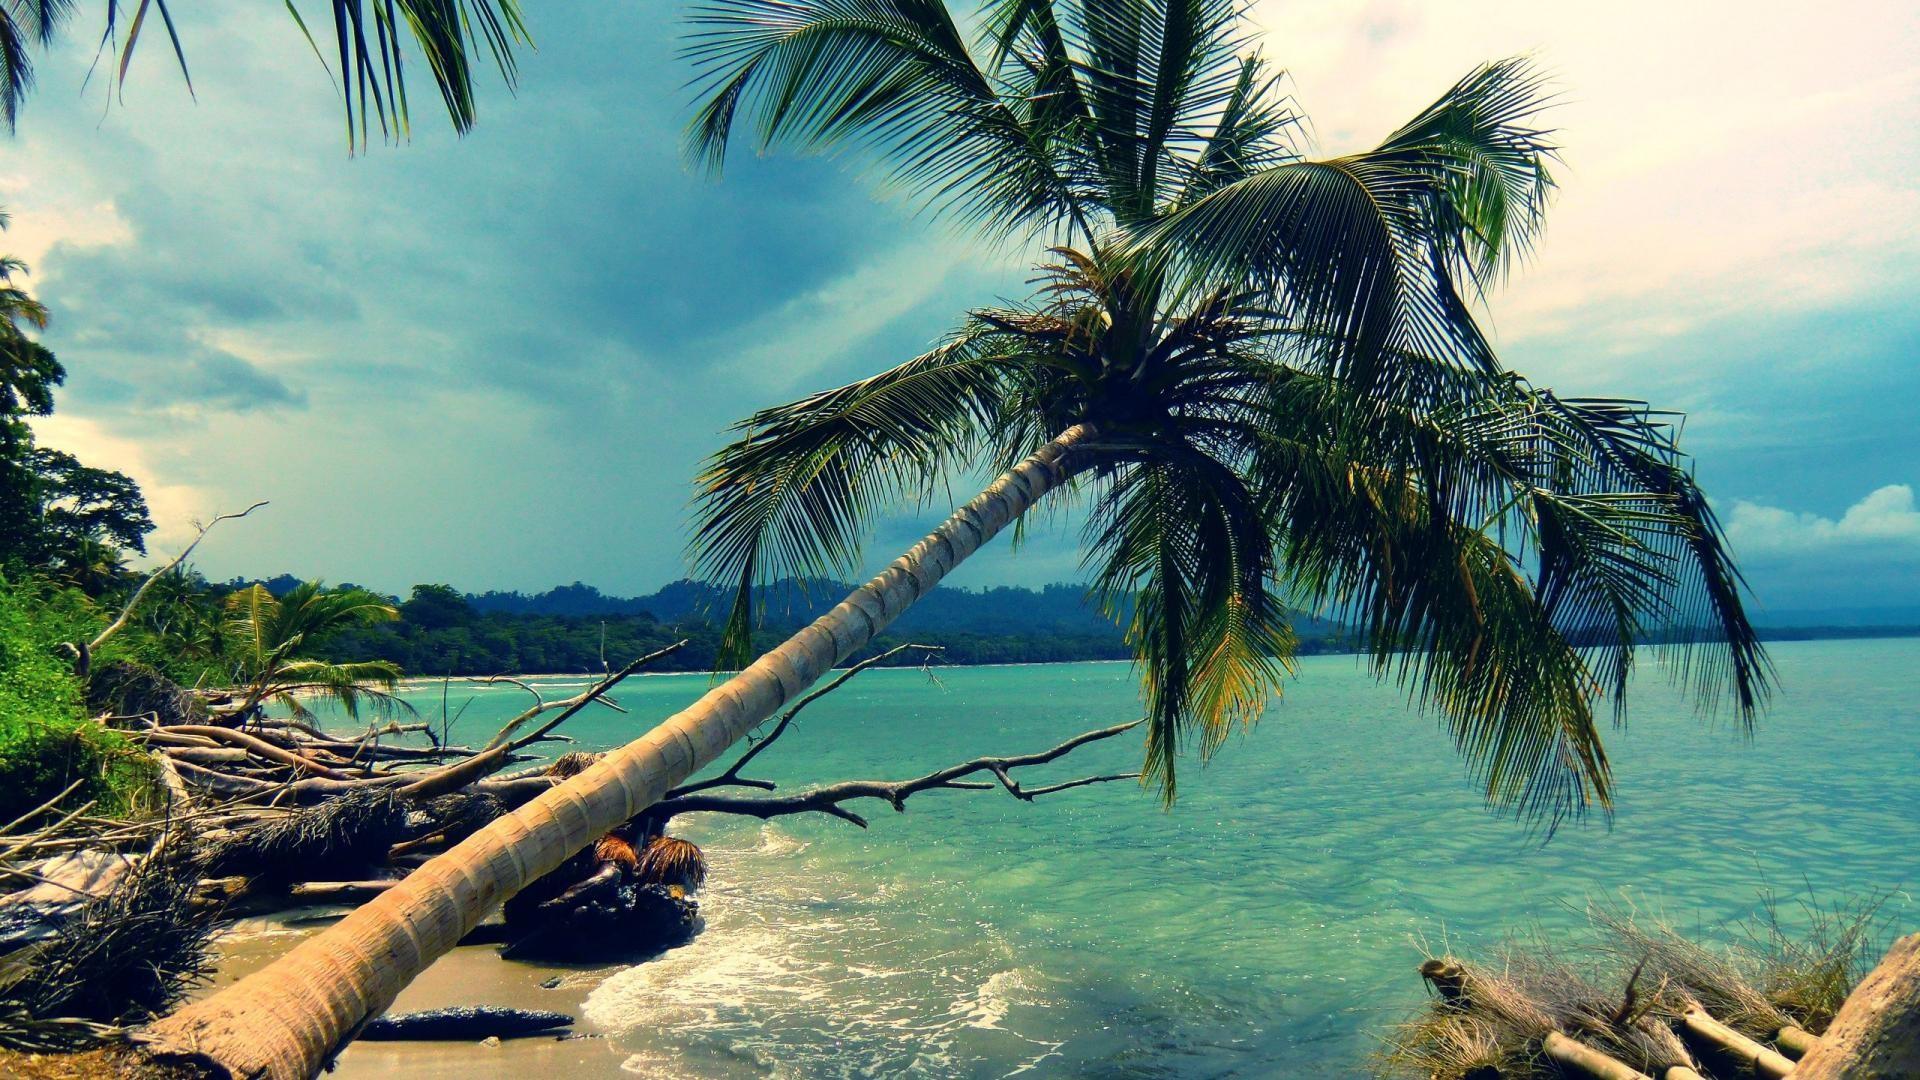 General 1920x1080 palm trees tropical sea coast